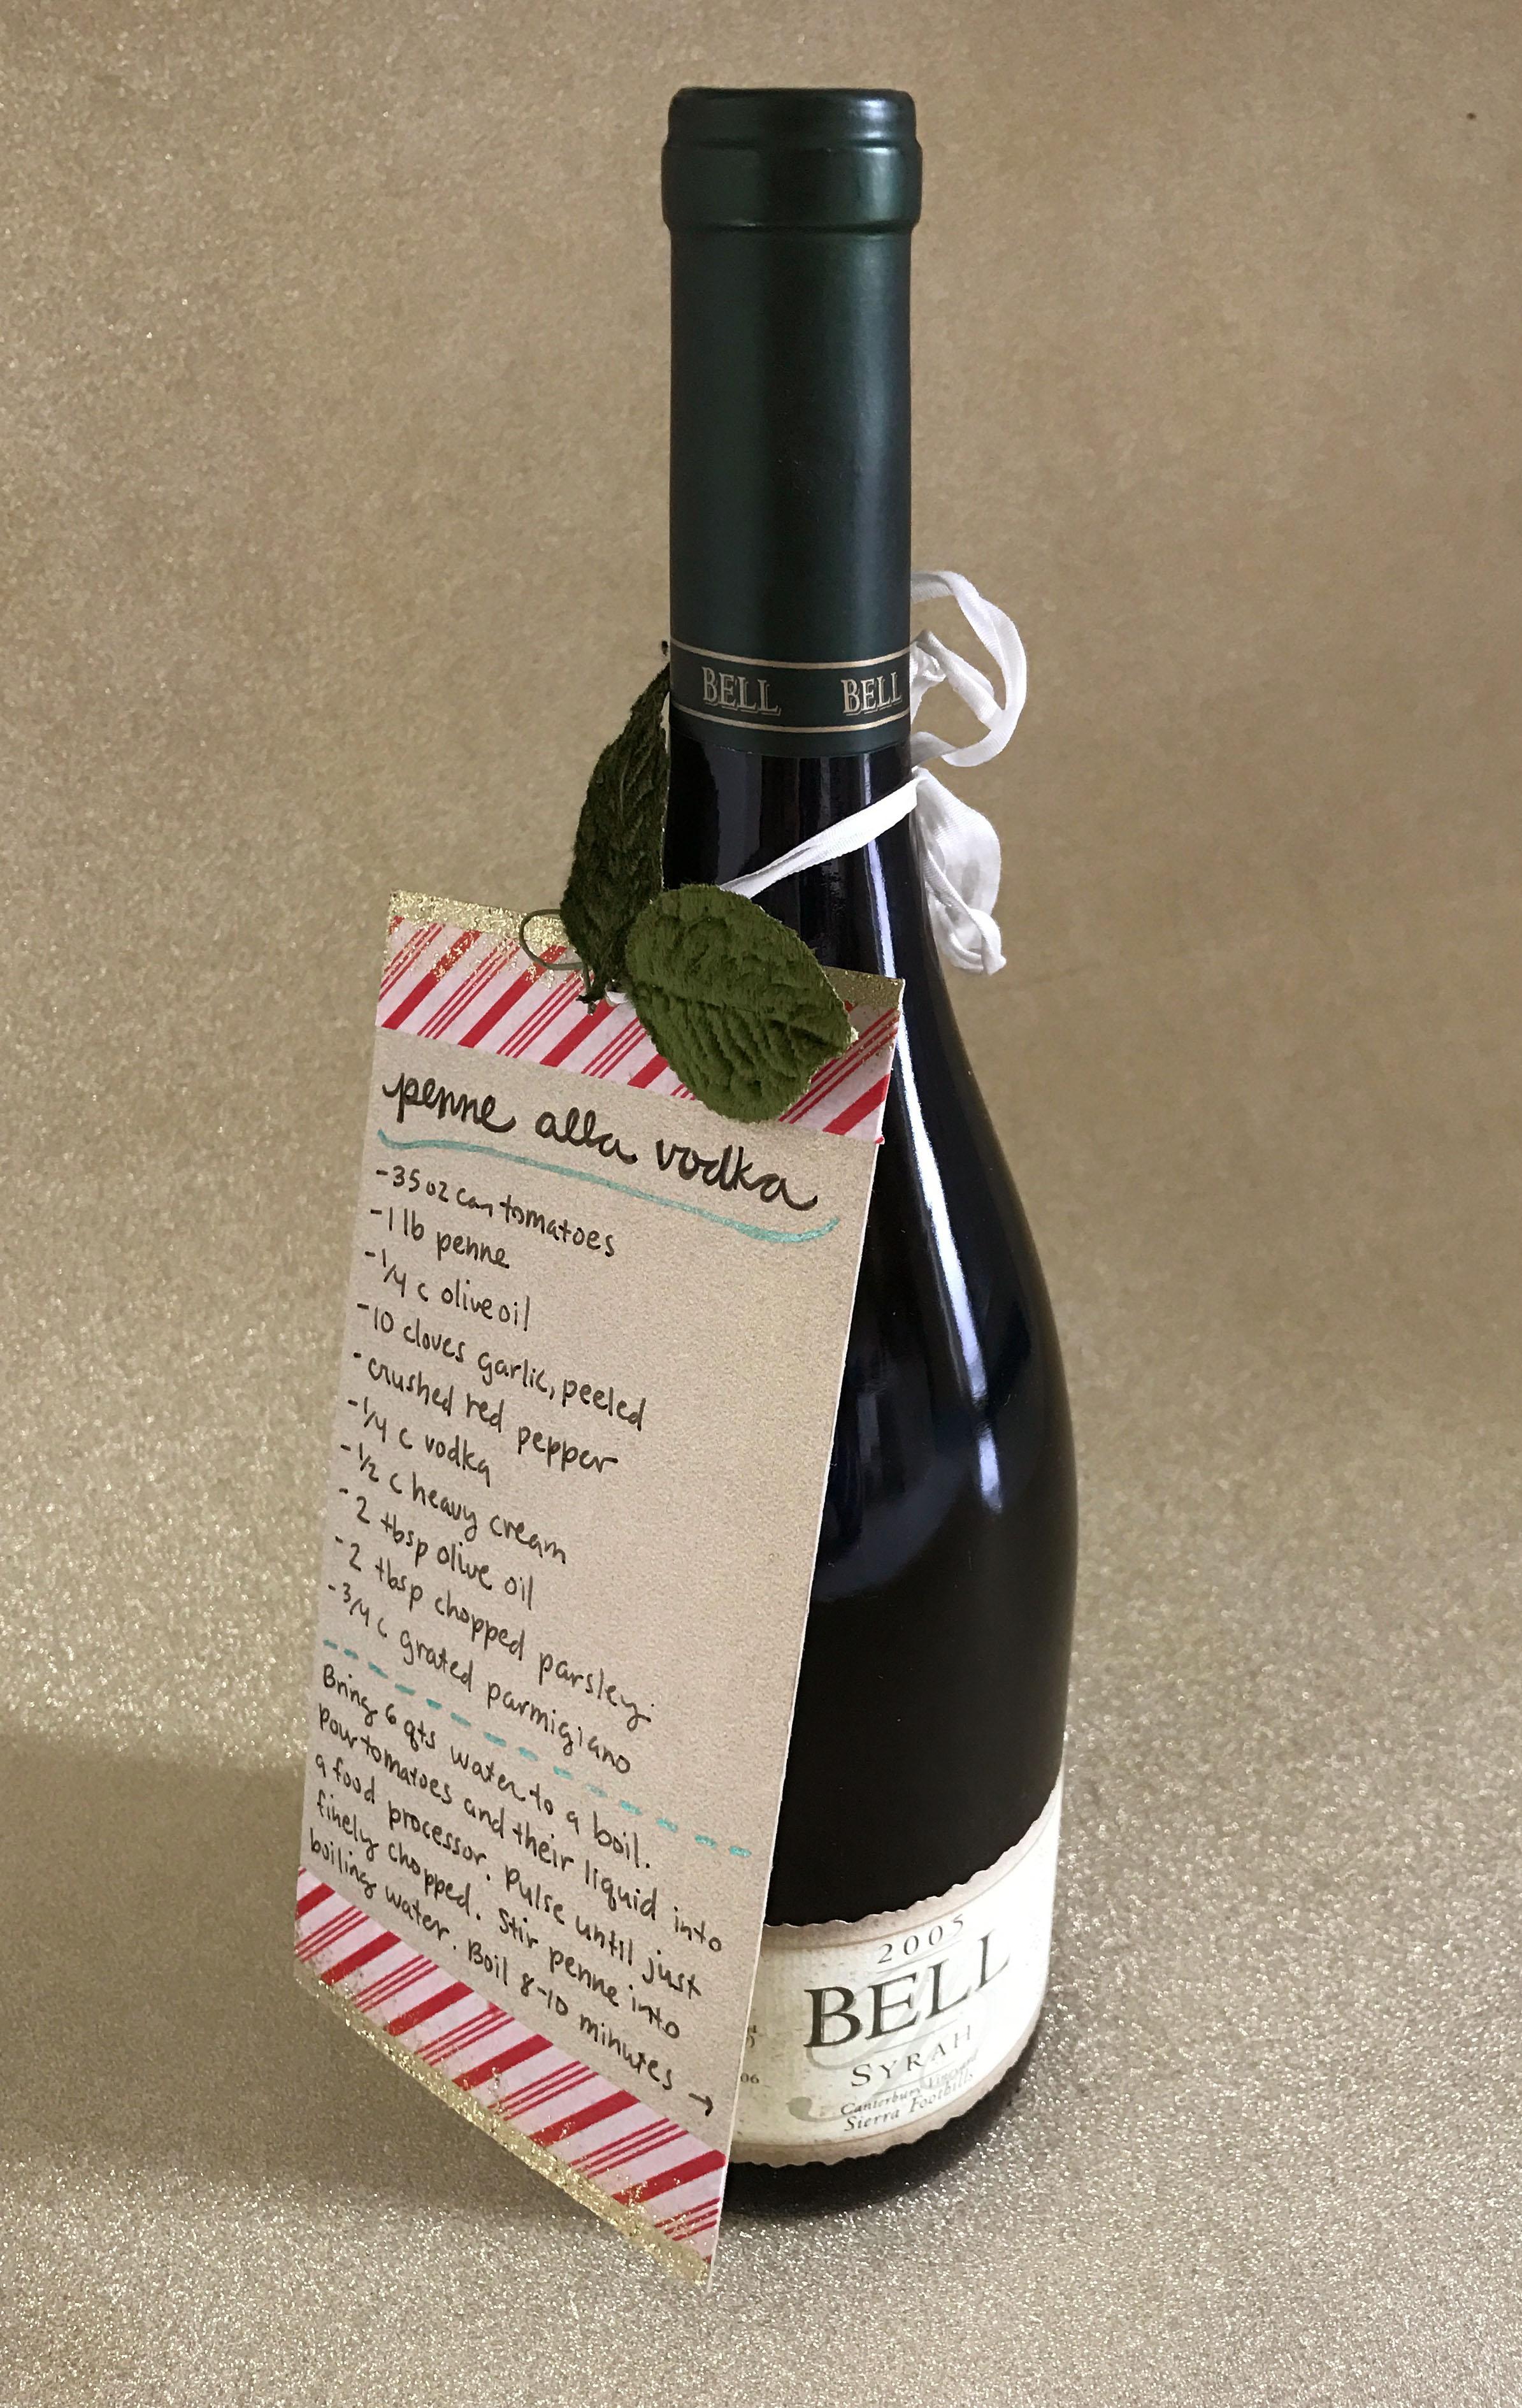 Wine Bottle Recipe Pairing